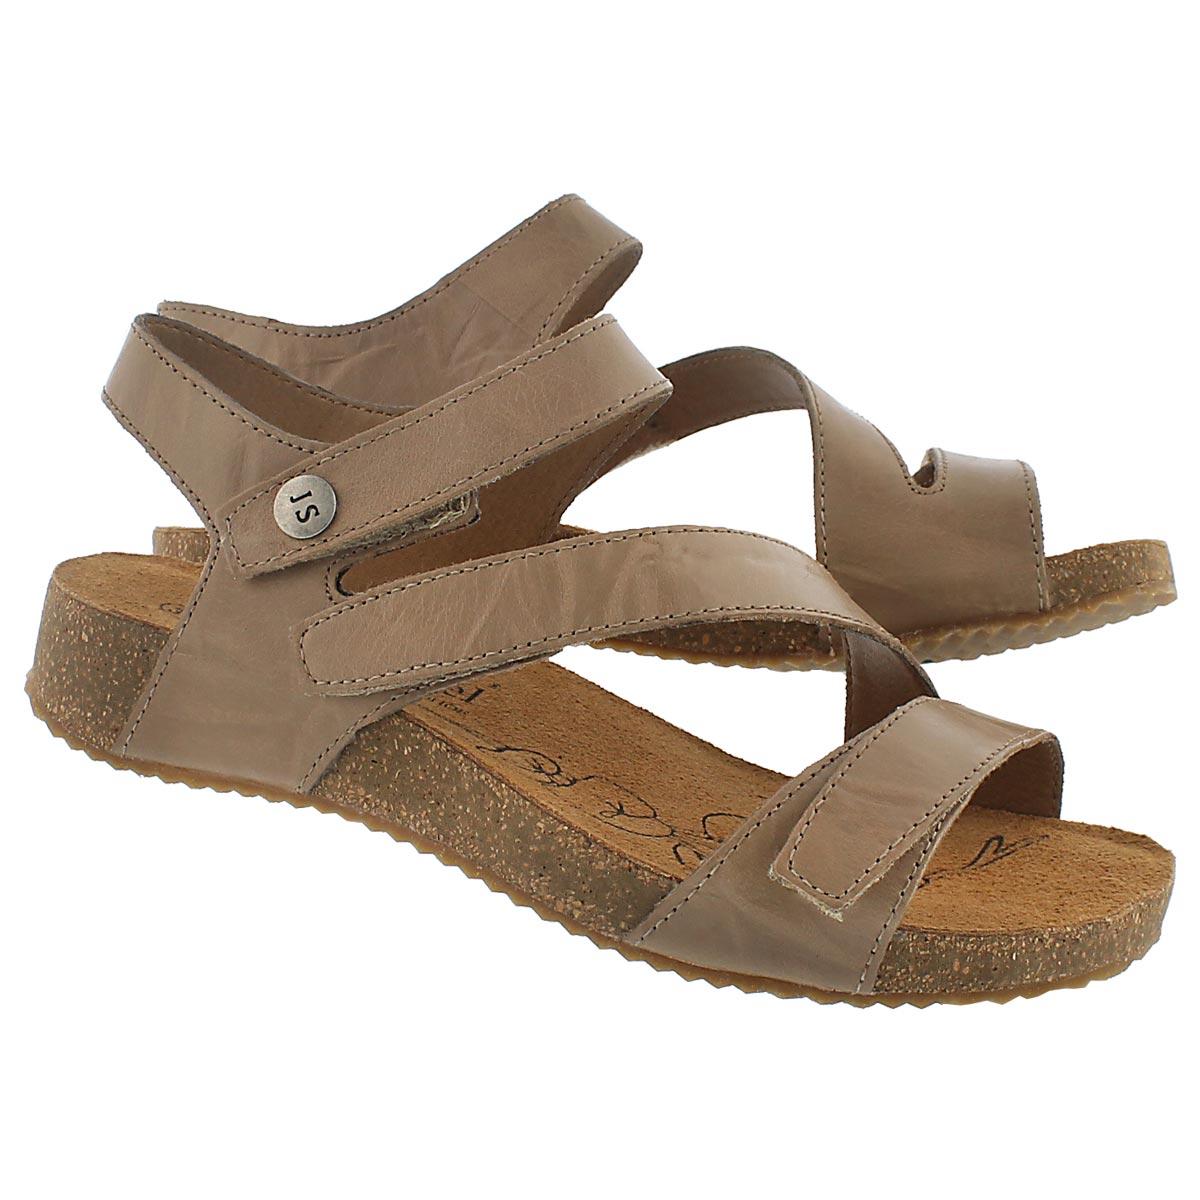 Lds Tonga 25 beige casual sandal